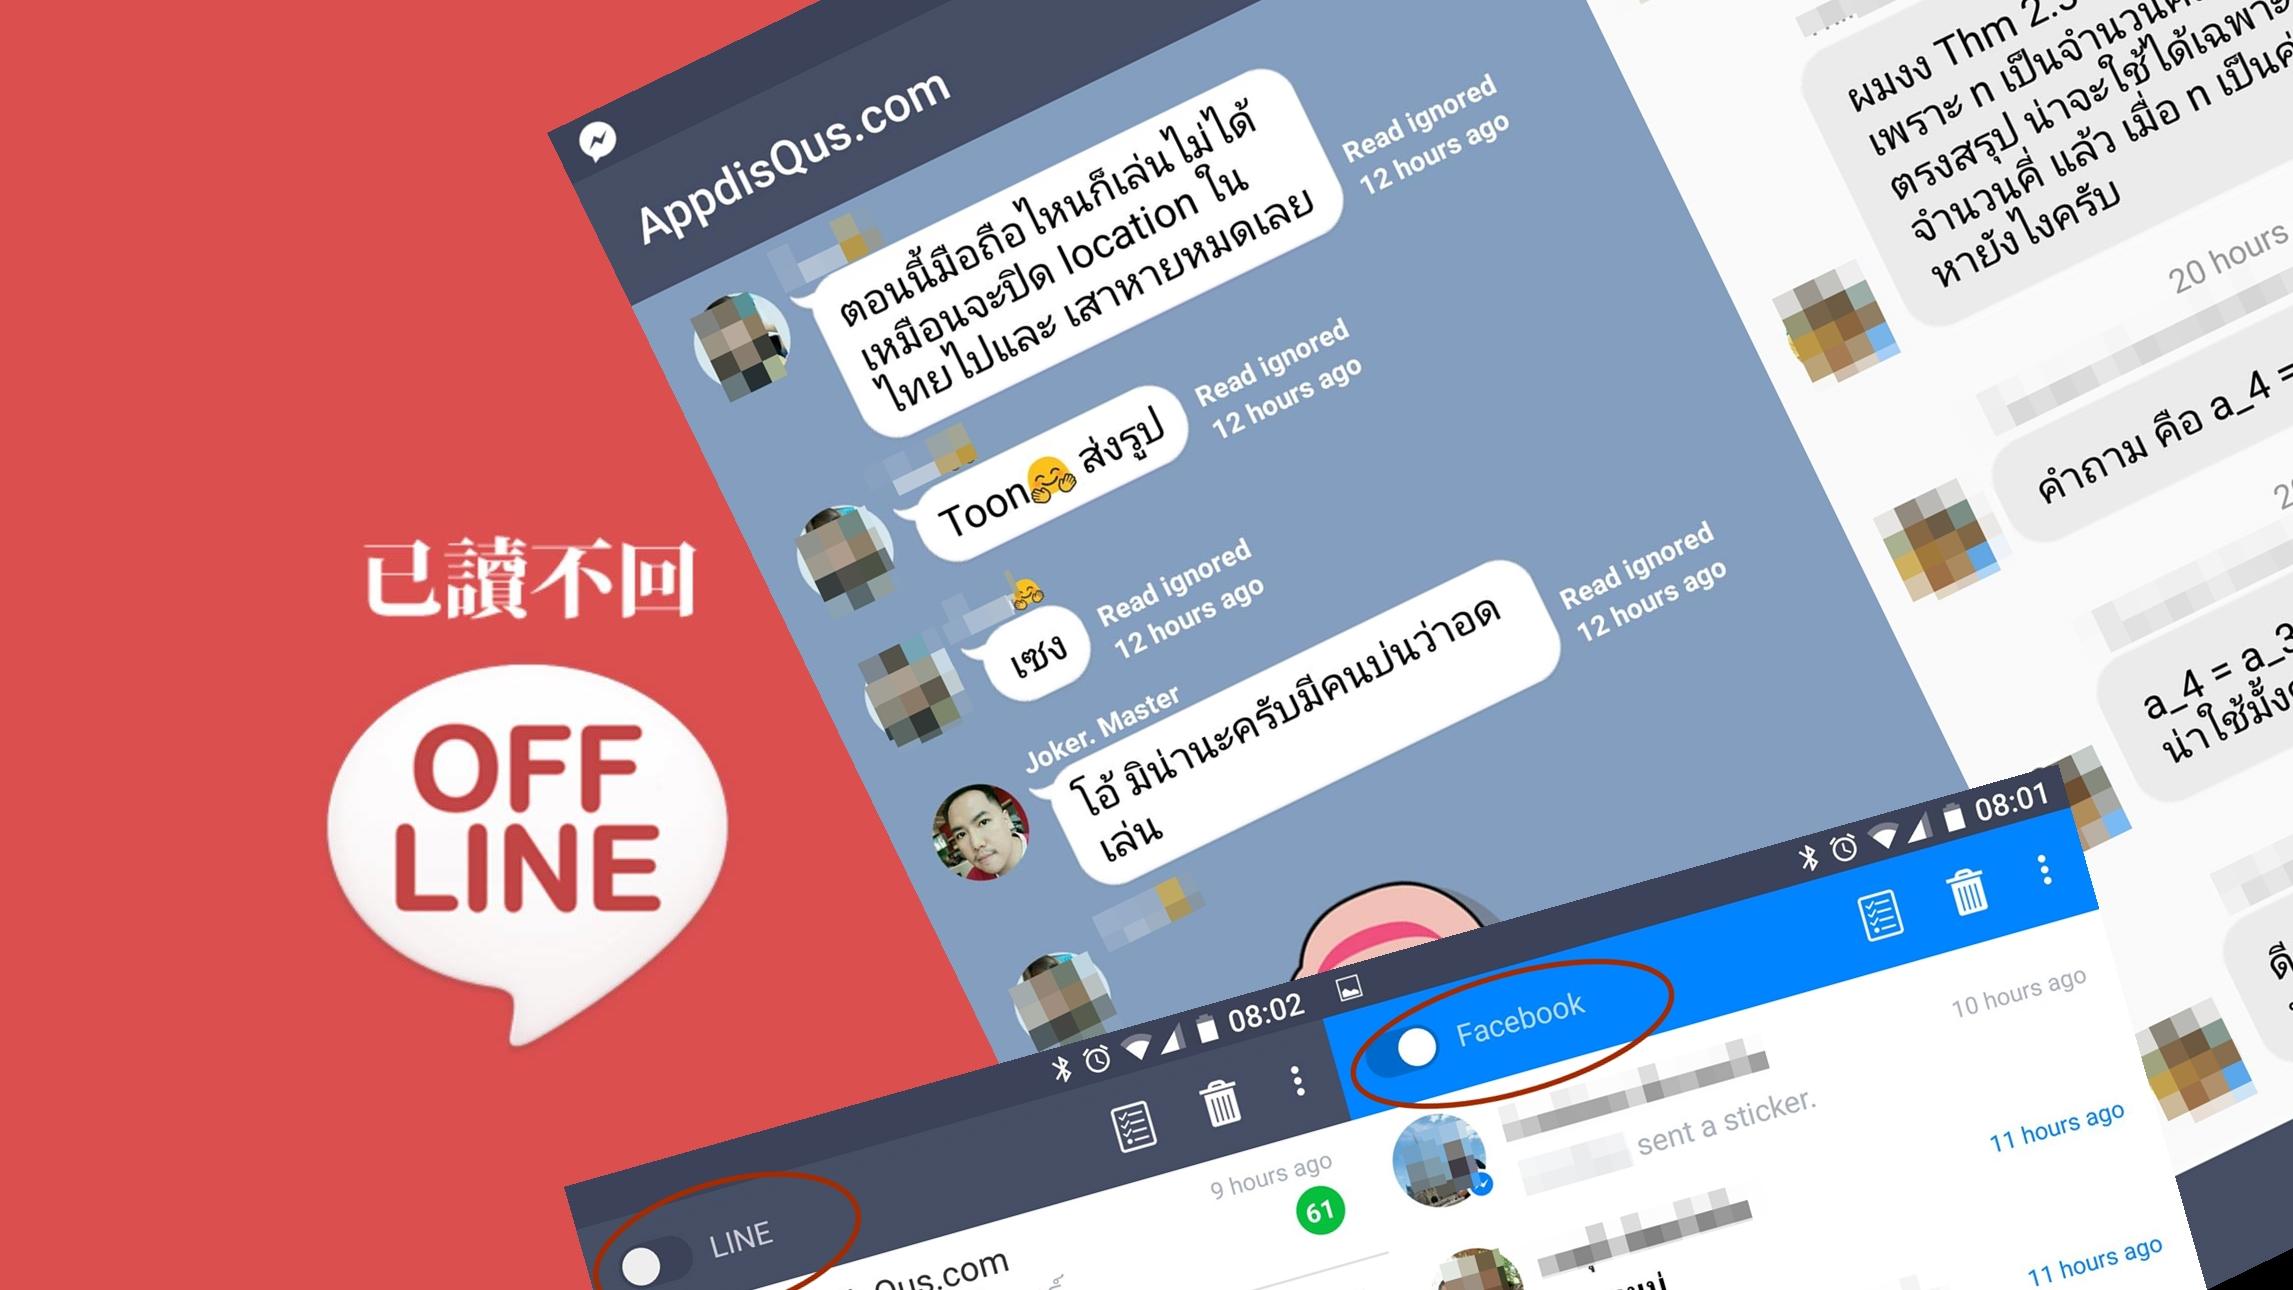 line, messenger, offline